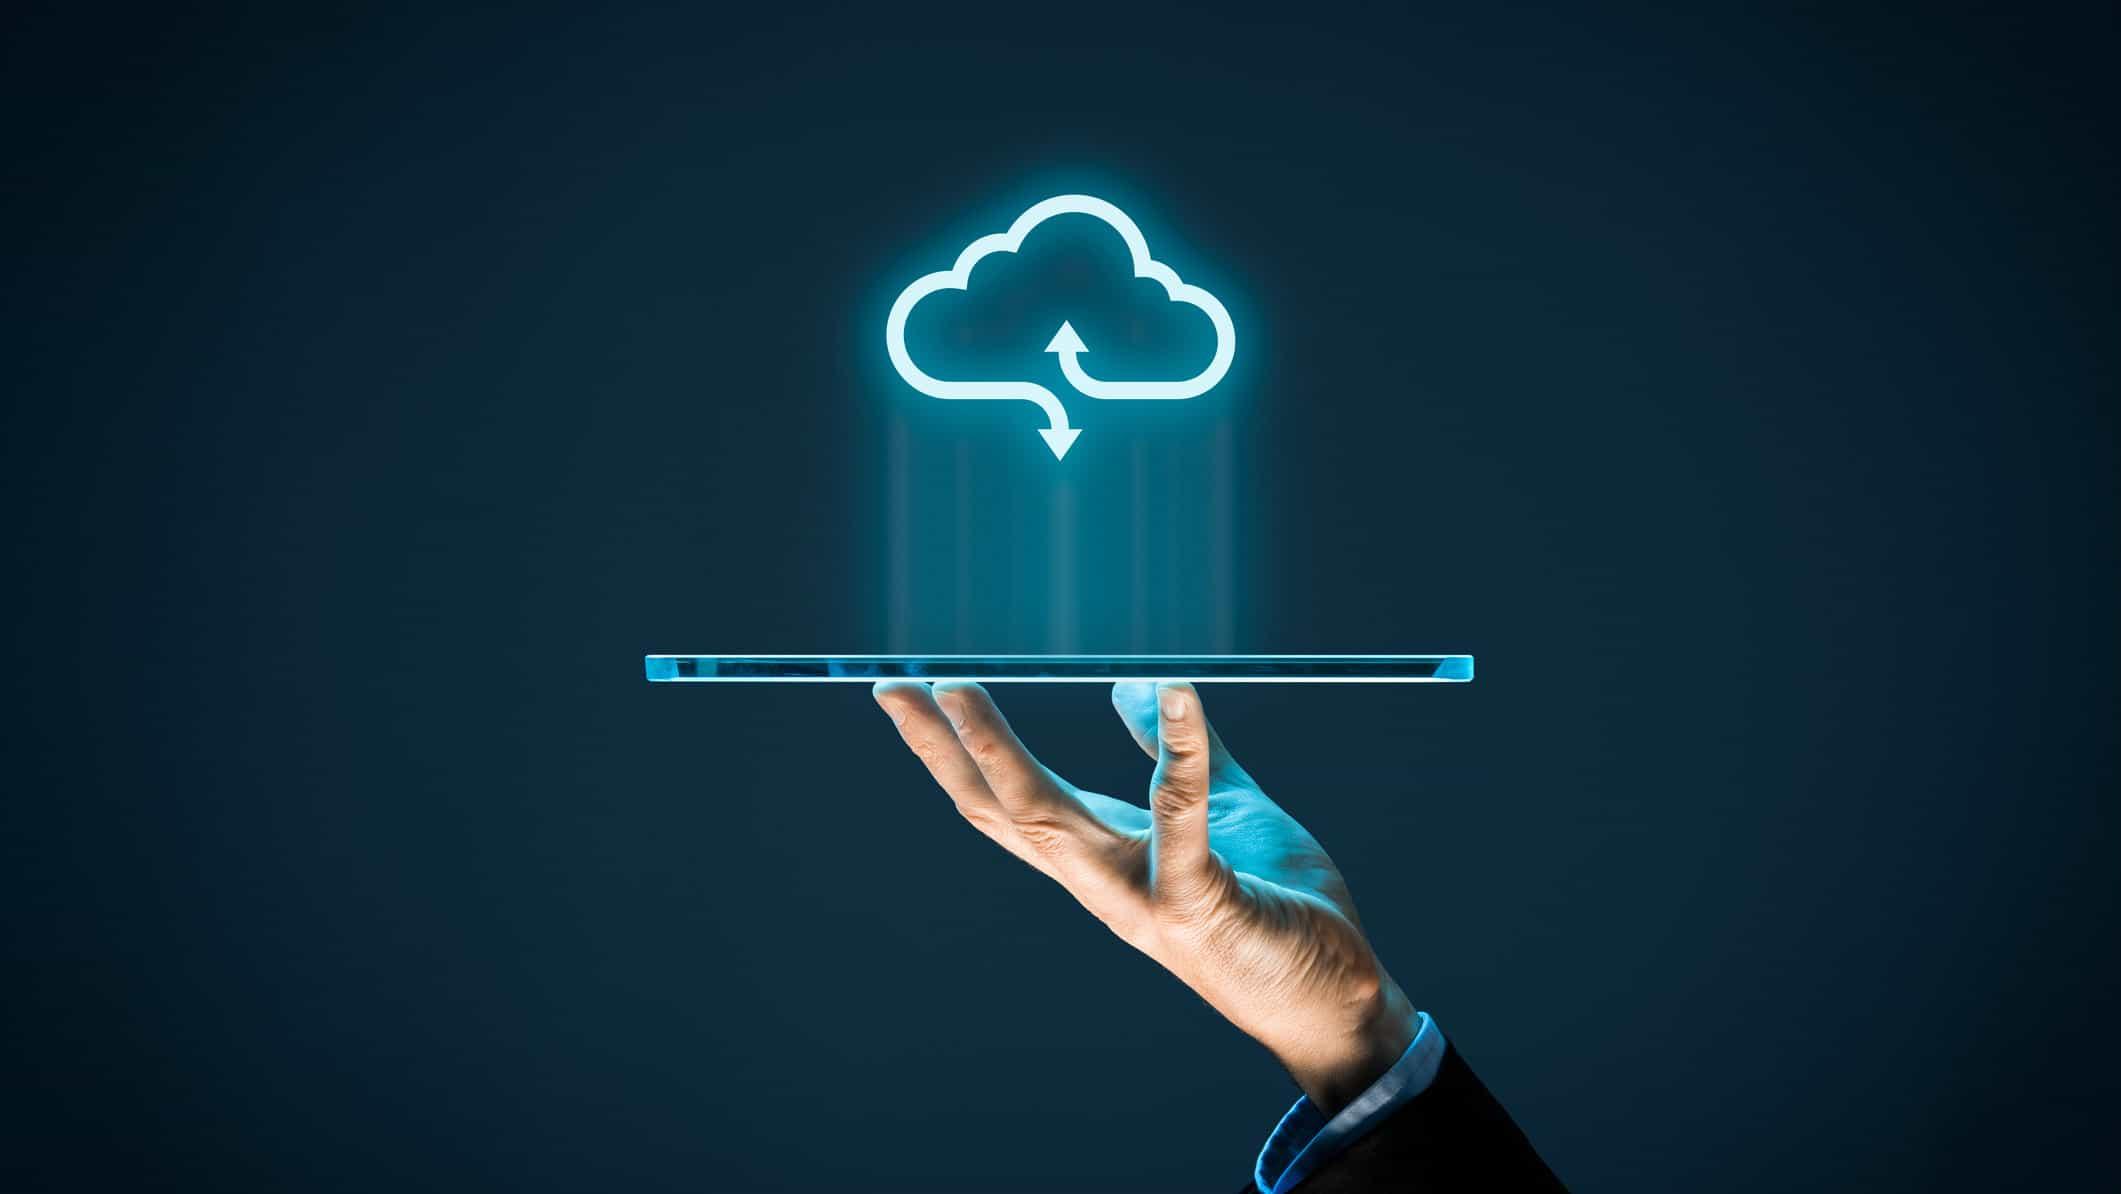 cloud computing, cloud, software, technology